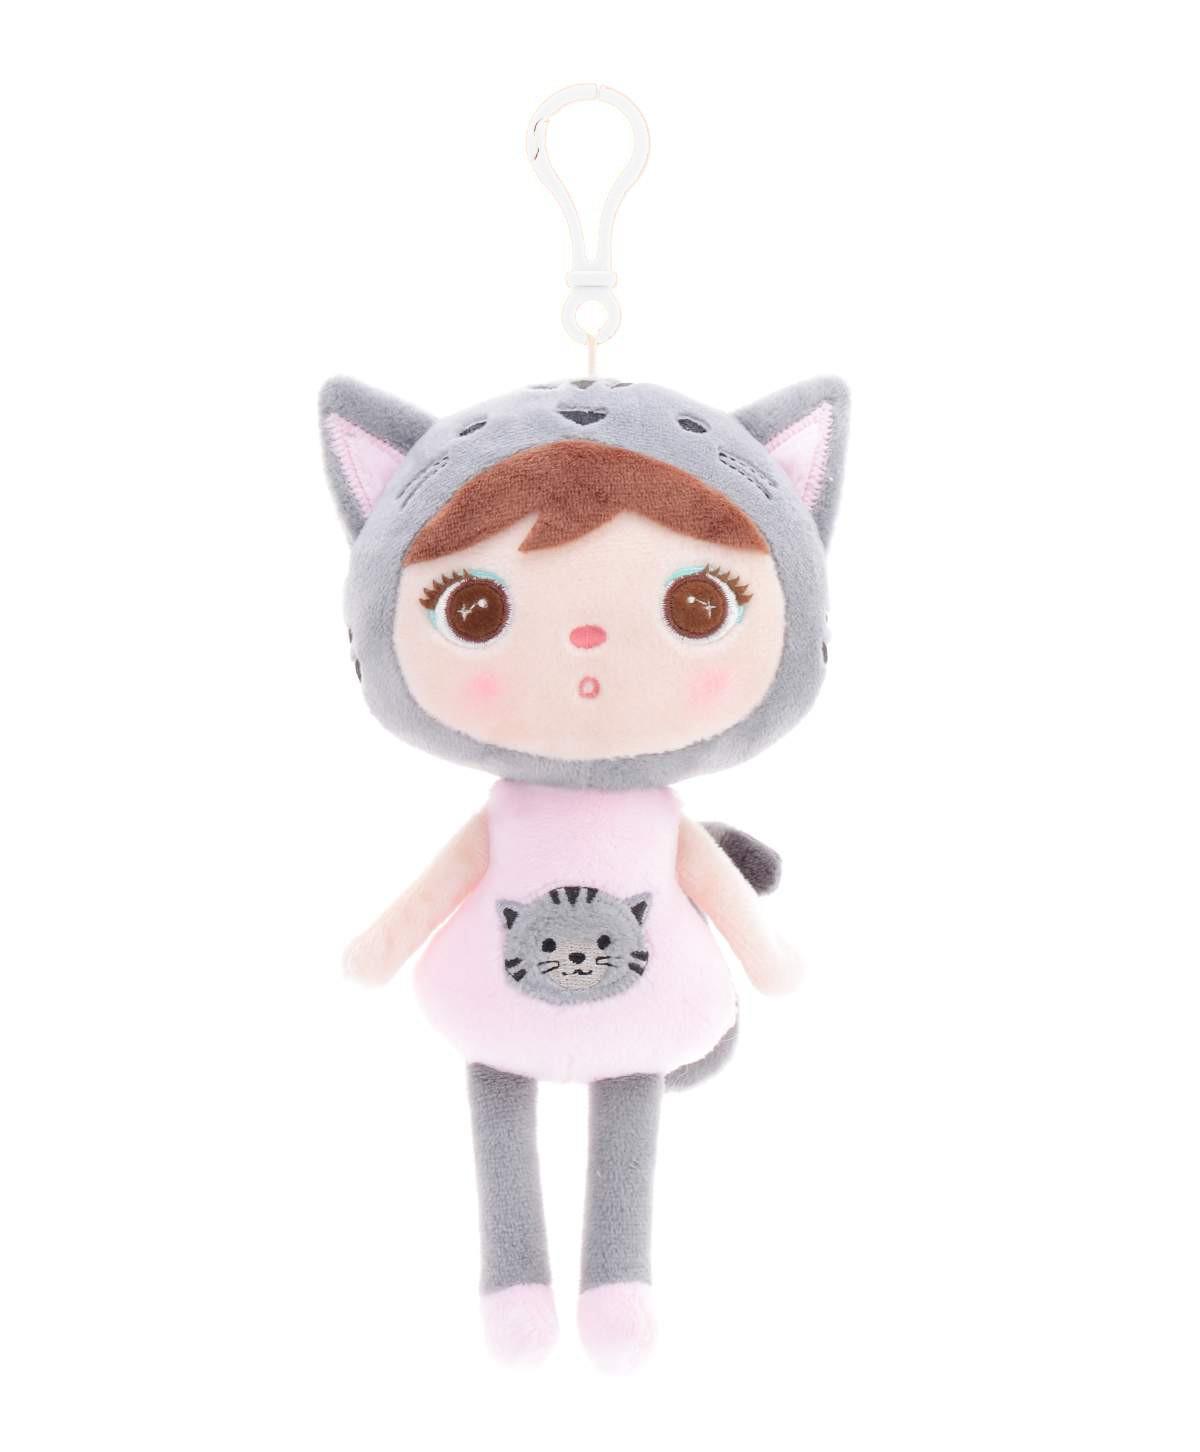 Mini Stoffpuppe Katzenmädchen mit Anhänger grau rosa 20 cm 1389-2-1